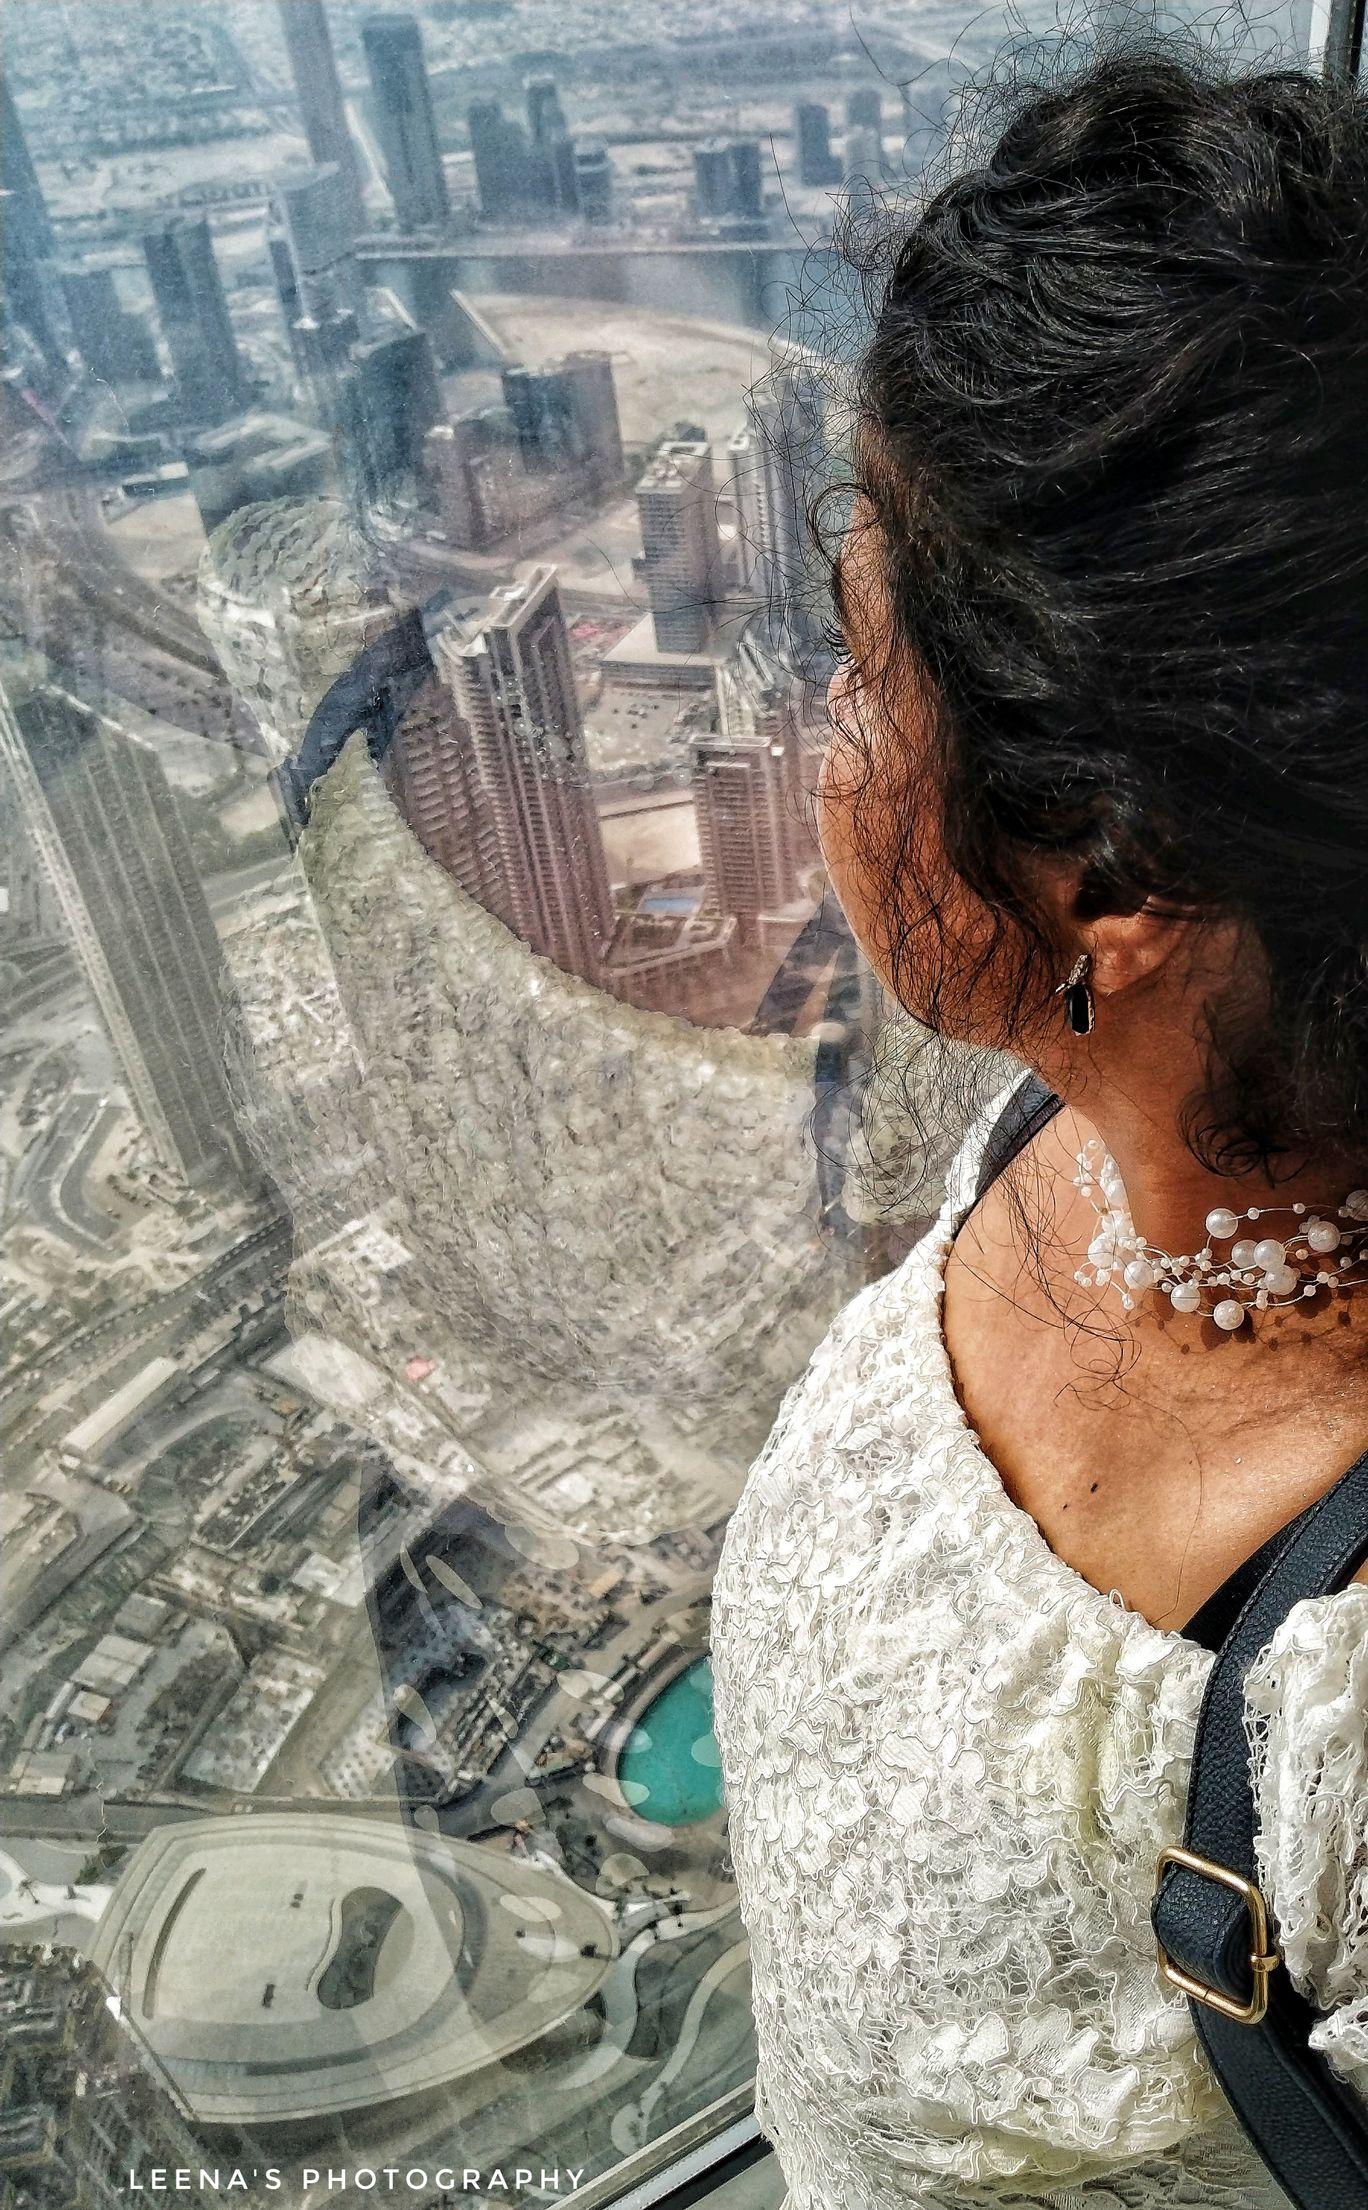 Photo of Burj Khalifa - Sheikh Mohammed bin Rashid Boulevard - Dubai - United Arab Emirates By Leena